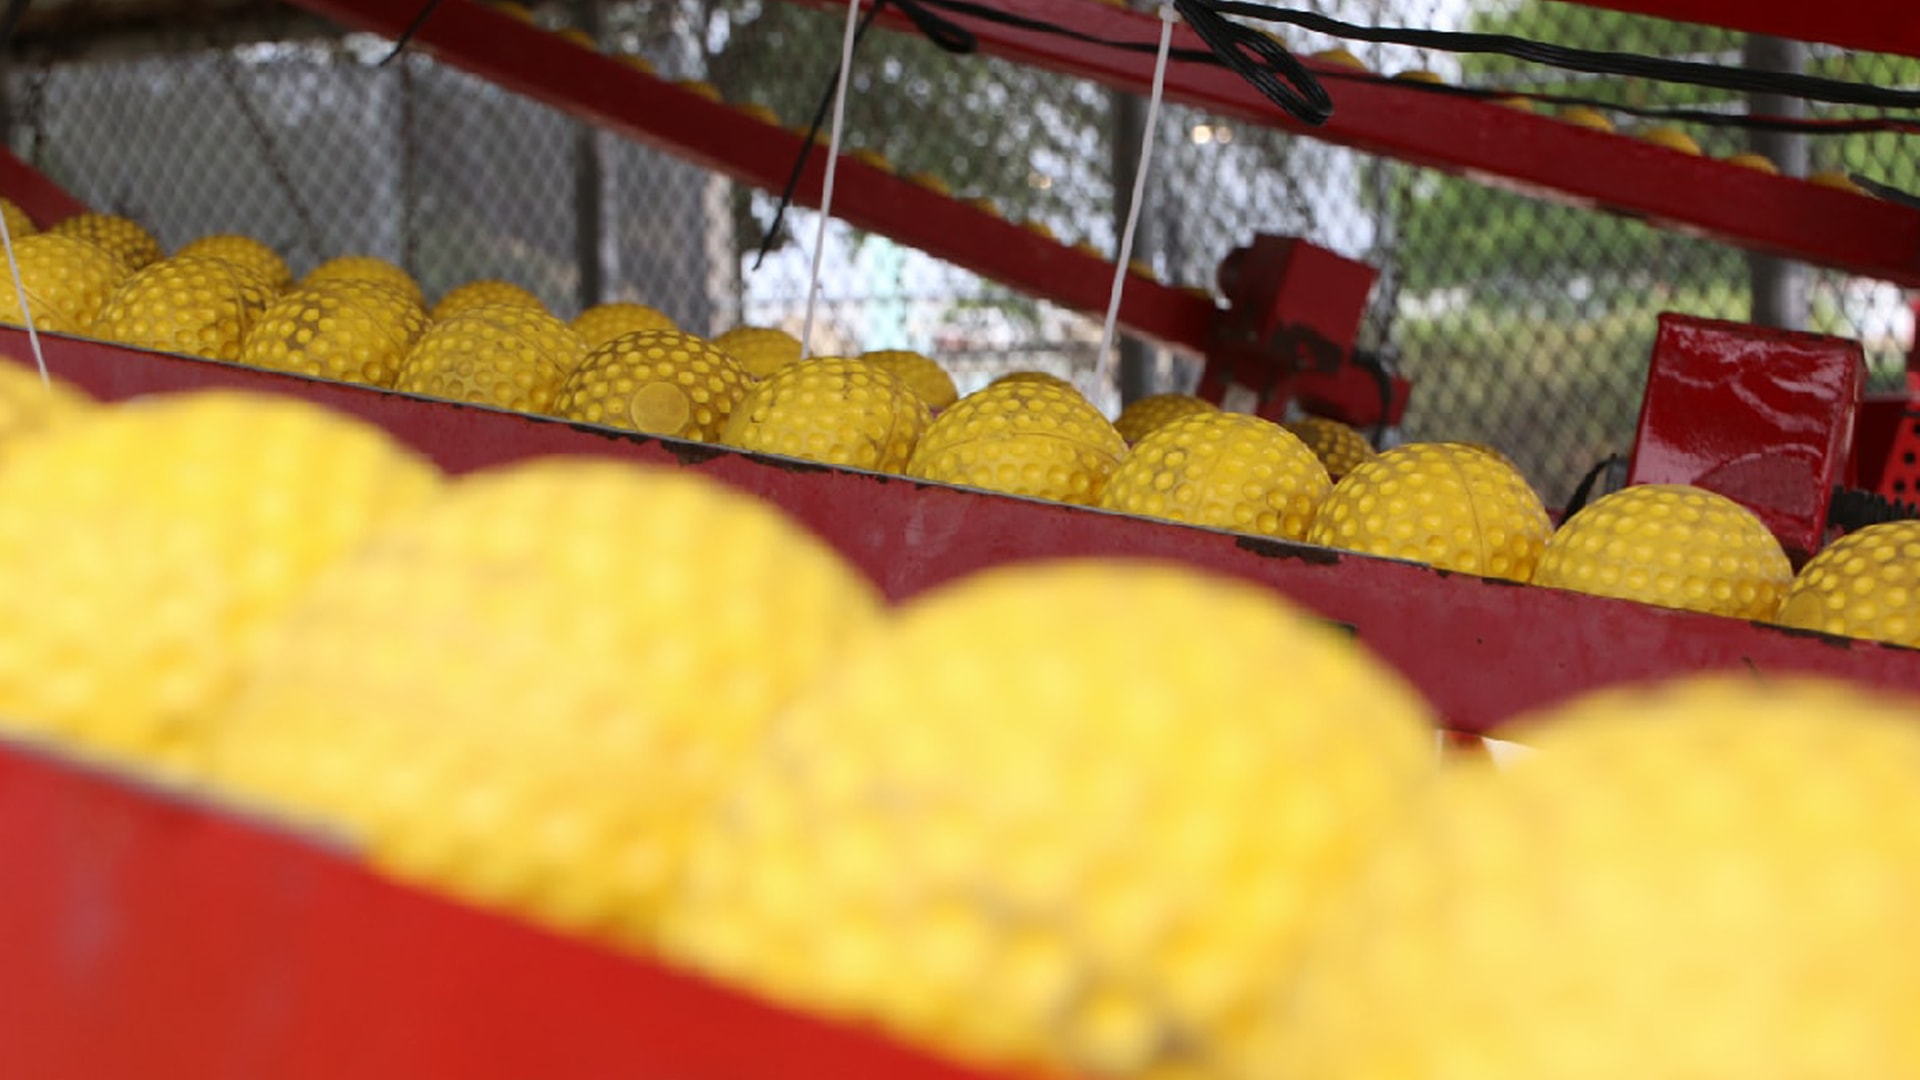 yellow cage balls